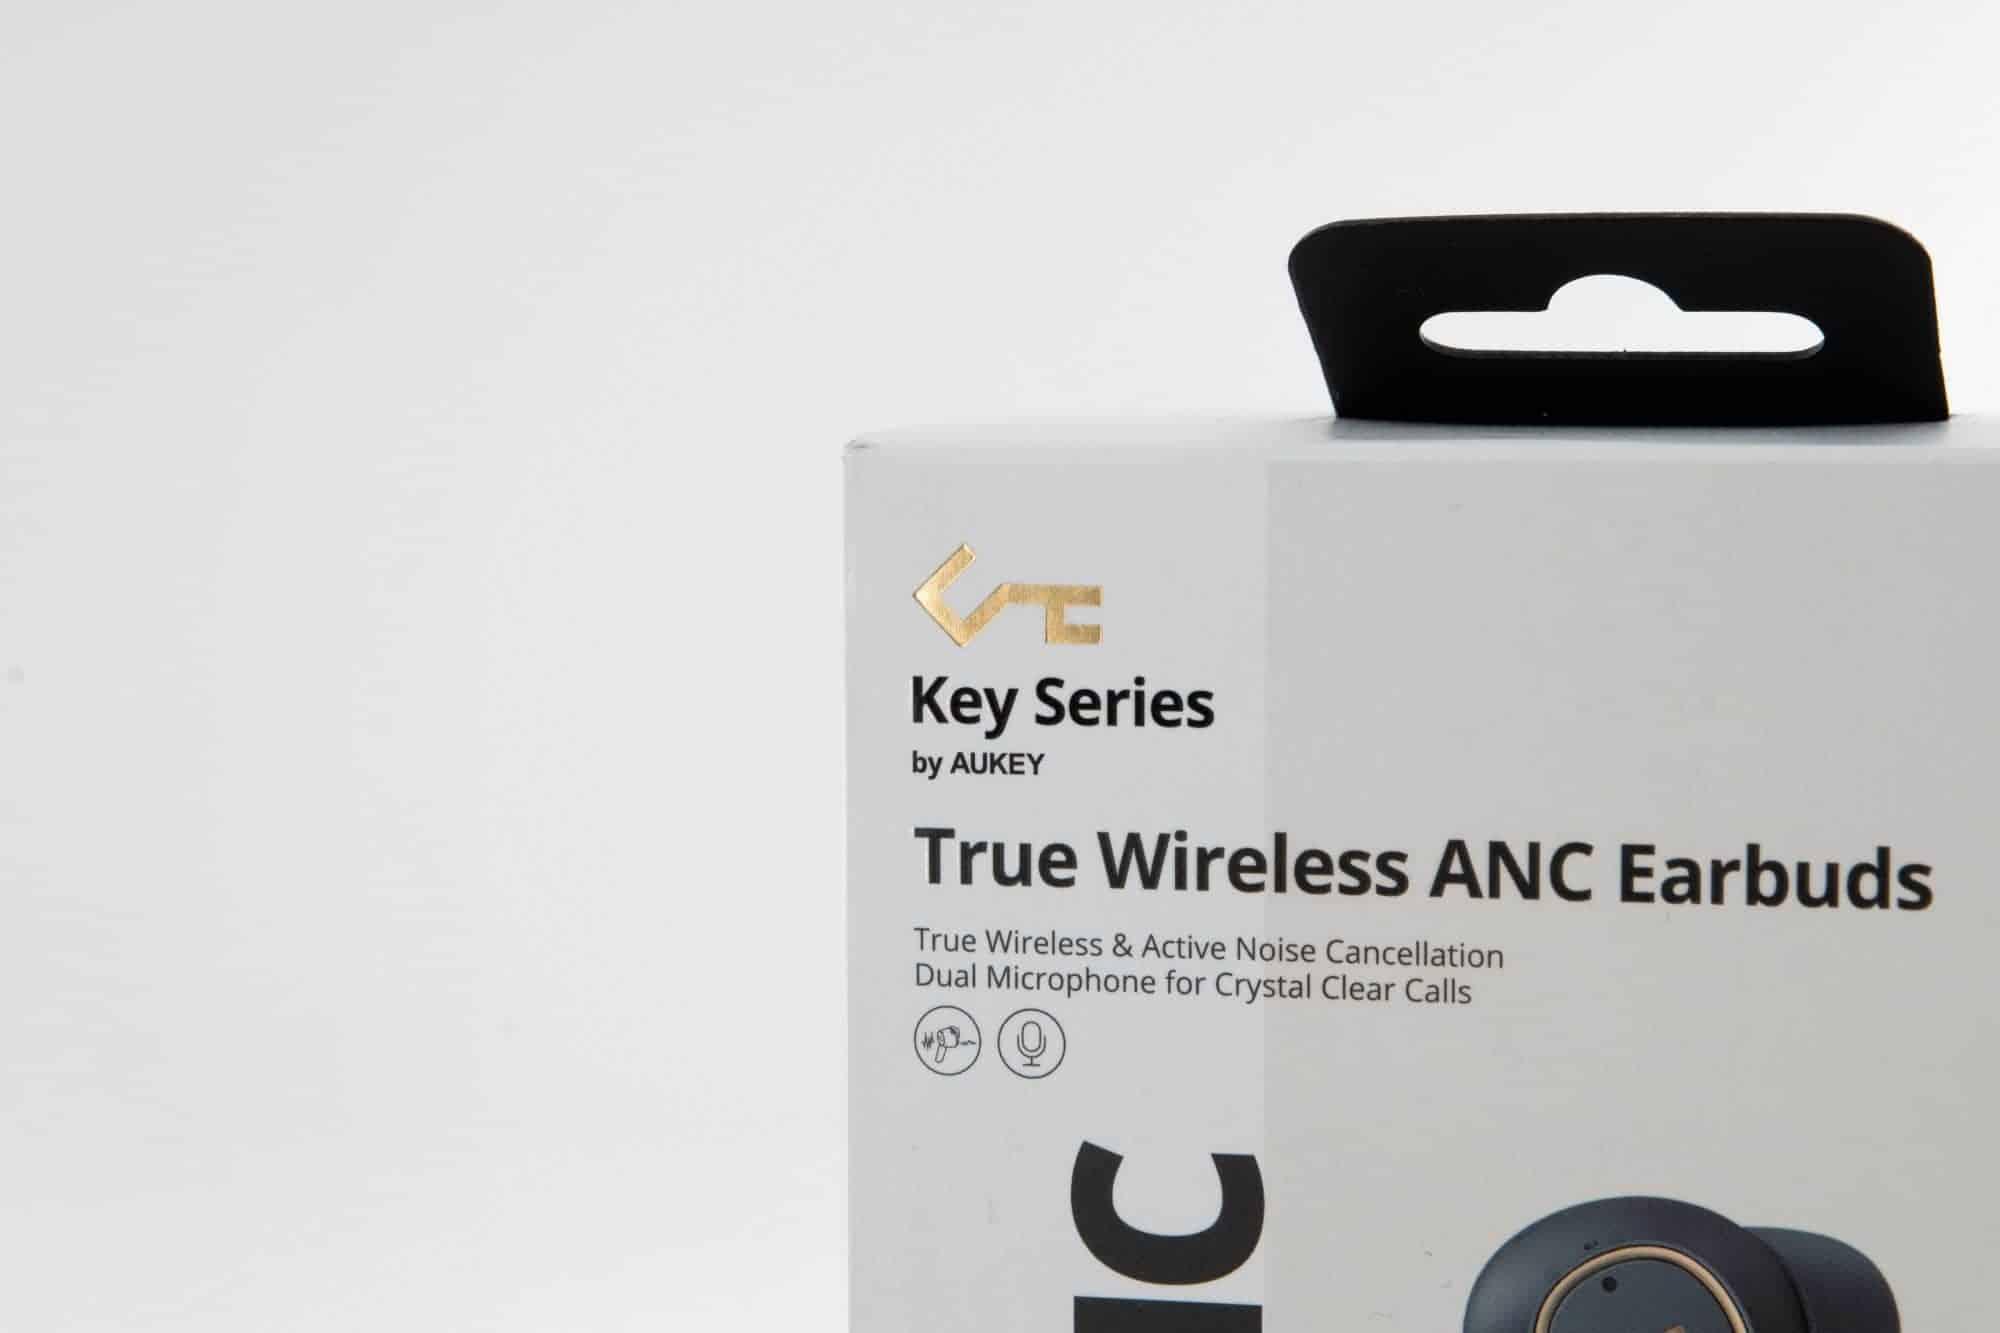 ANC、ENC雙降噪技術!AUKEY Key Series EP-T18NC ANC主動降噪真無線藍牙耳機推薦開箱